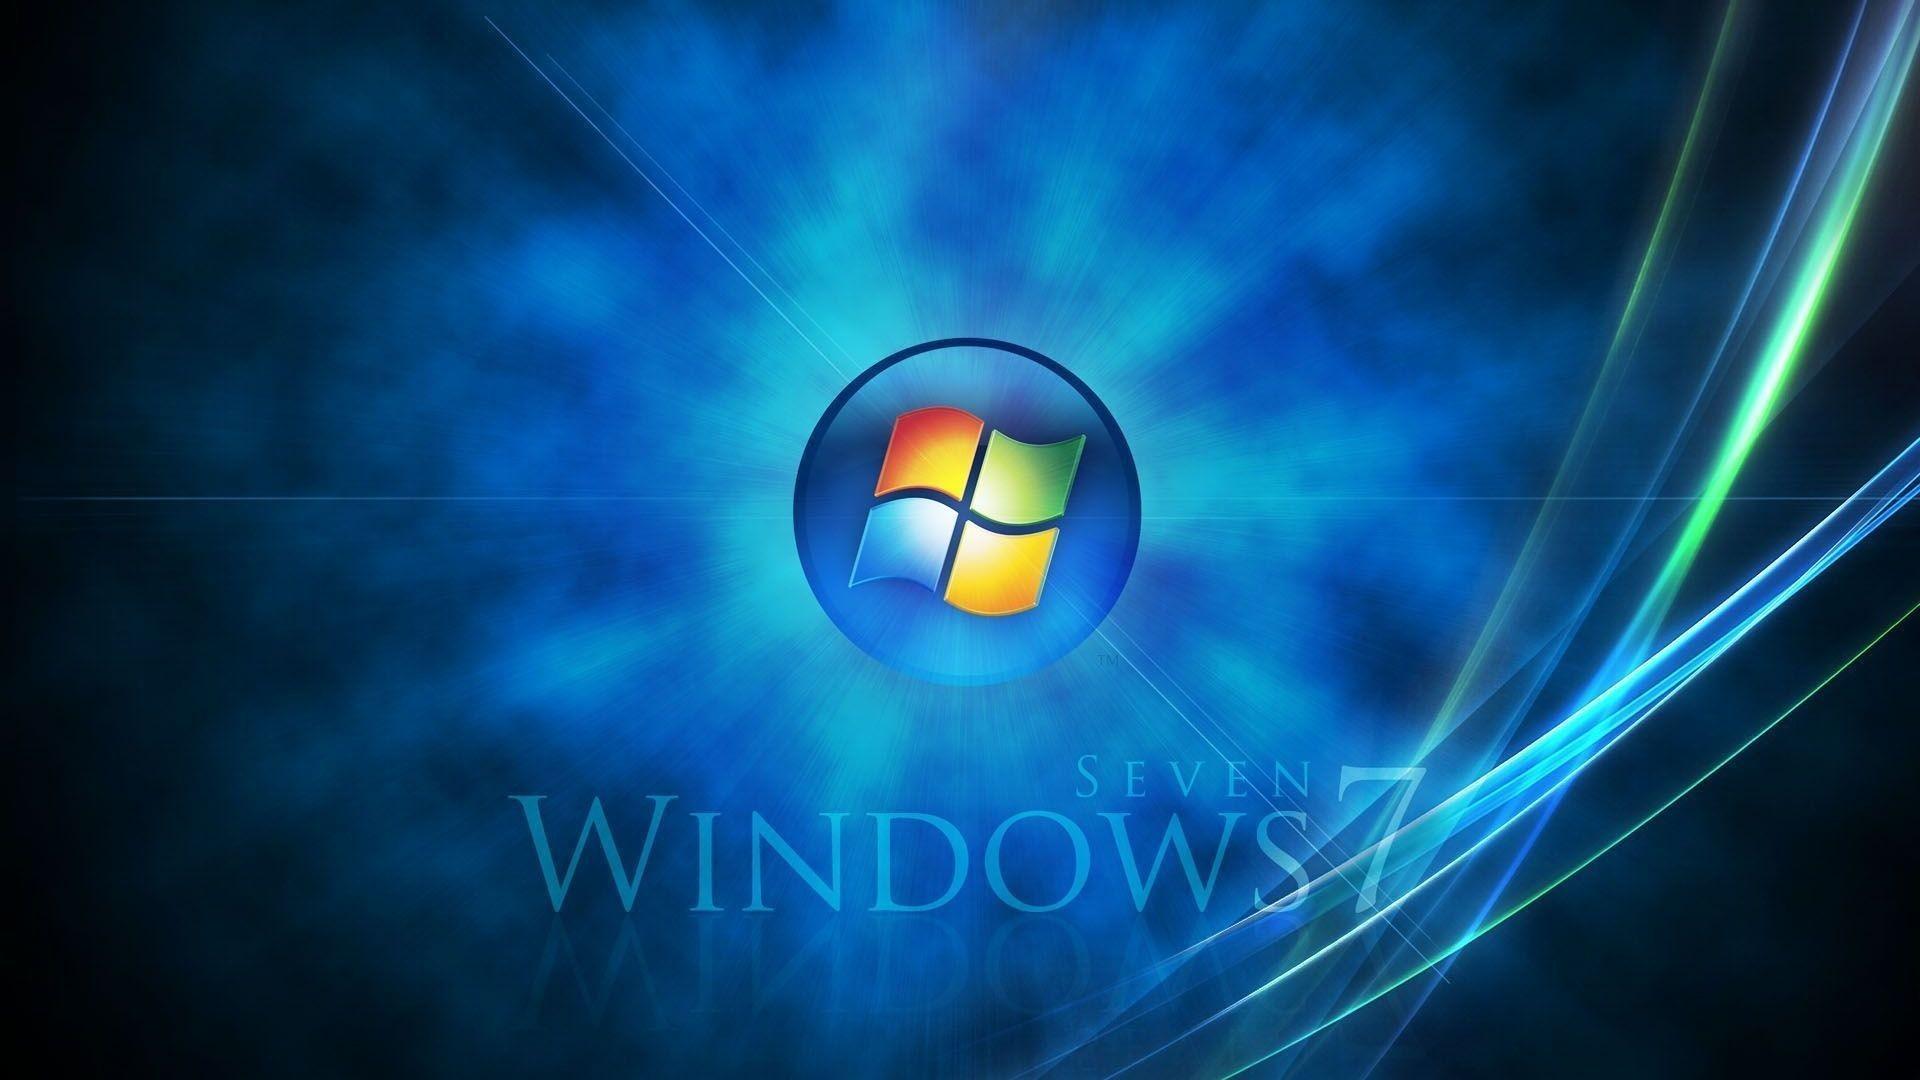 Windows 7 Ultimate Wallpaper Hd wallpaper – 360190